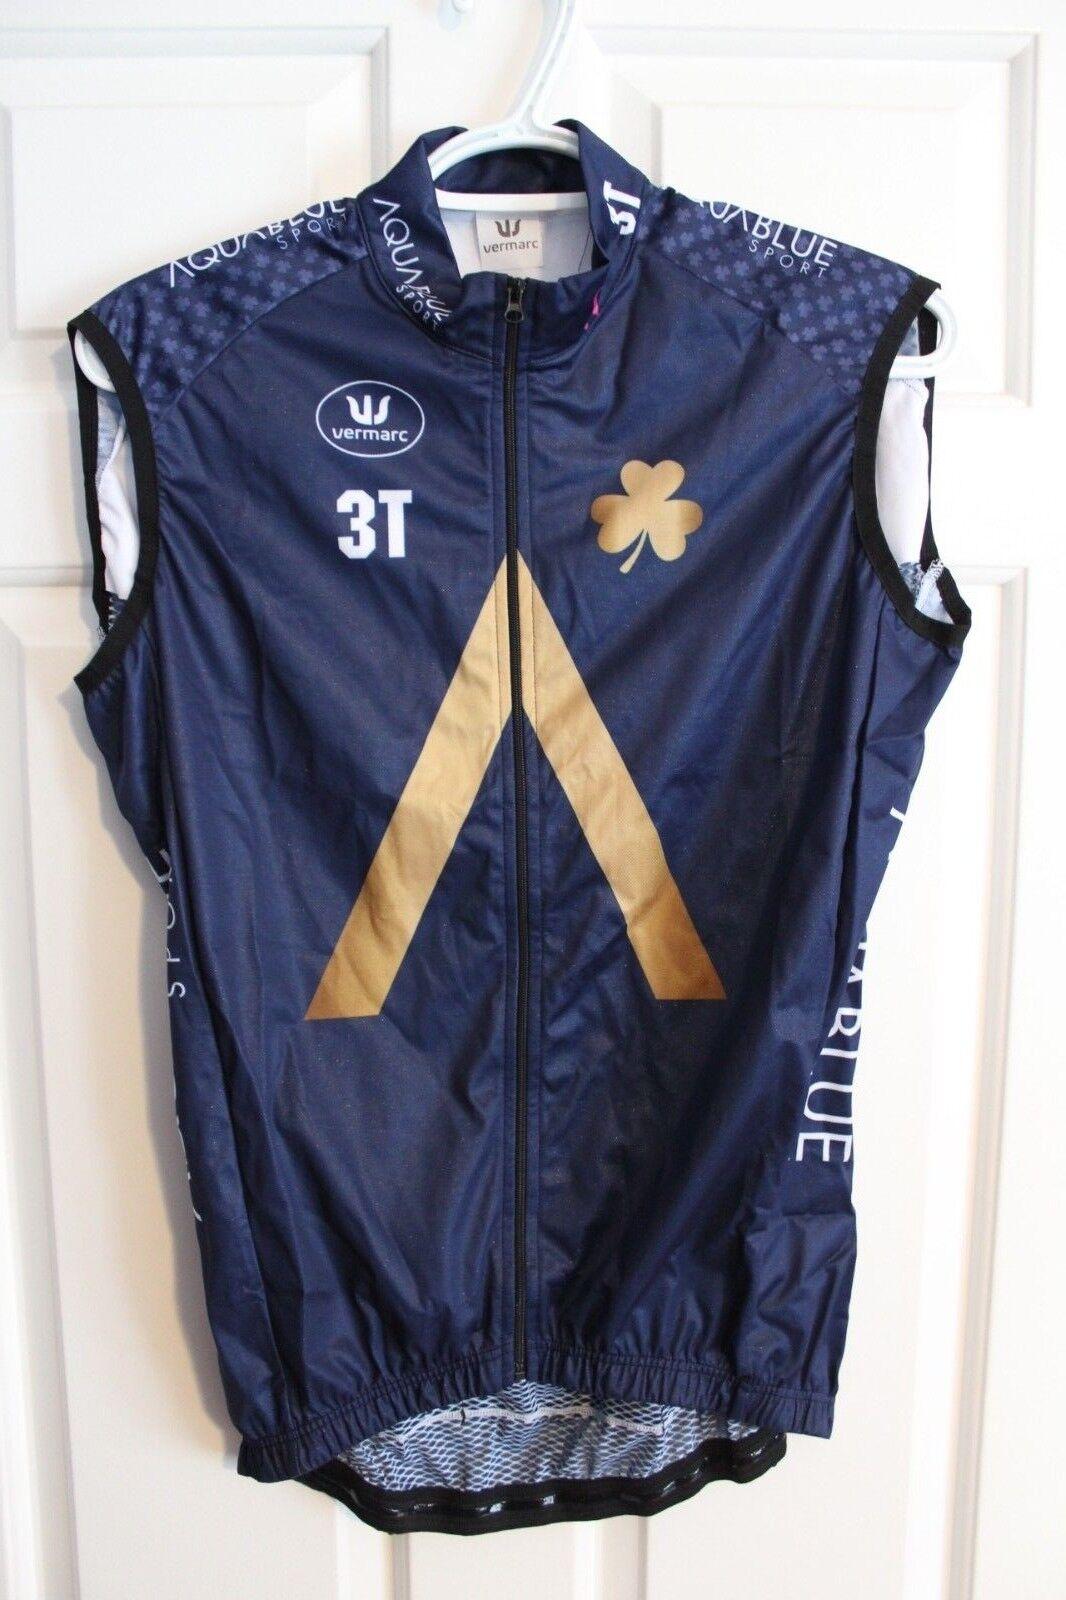 NEW Vermarc   Aqua bluee Sport Team Wind Vest    S M Small Medium   2018